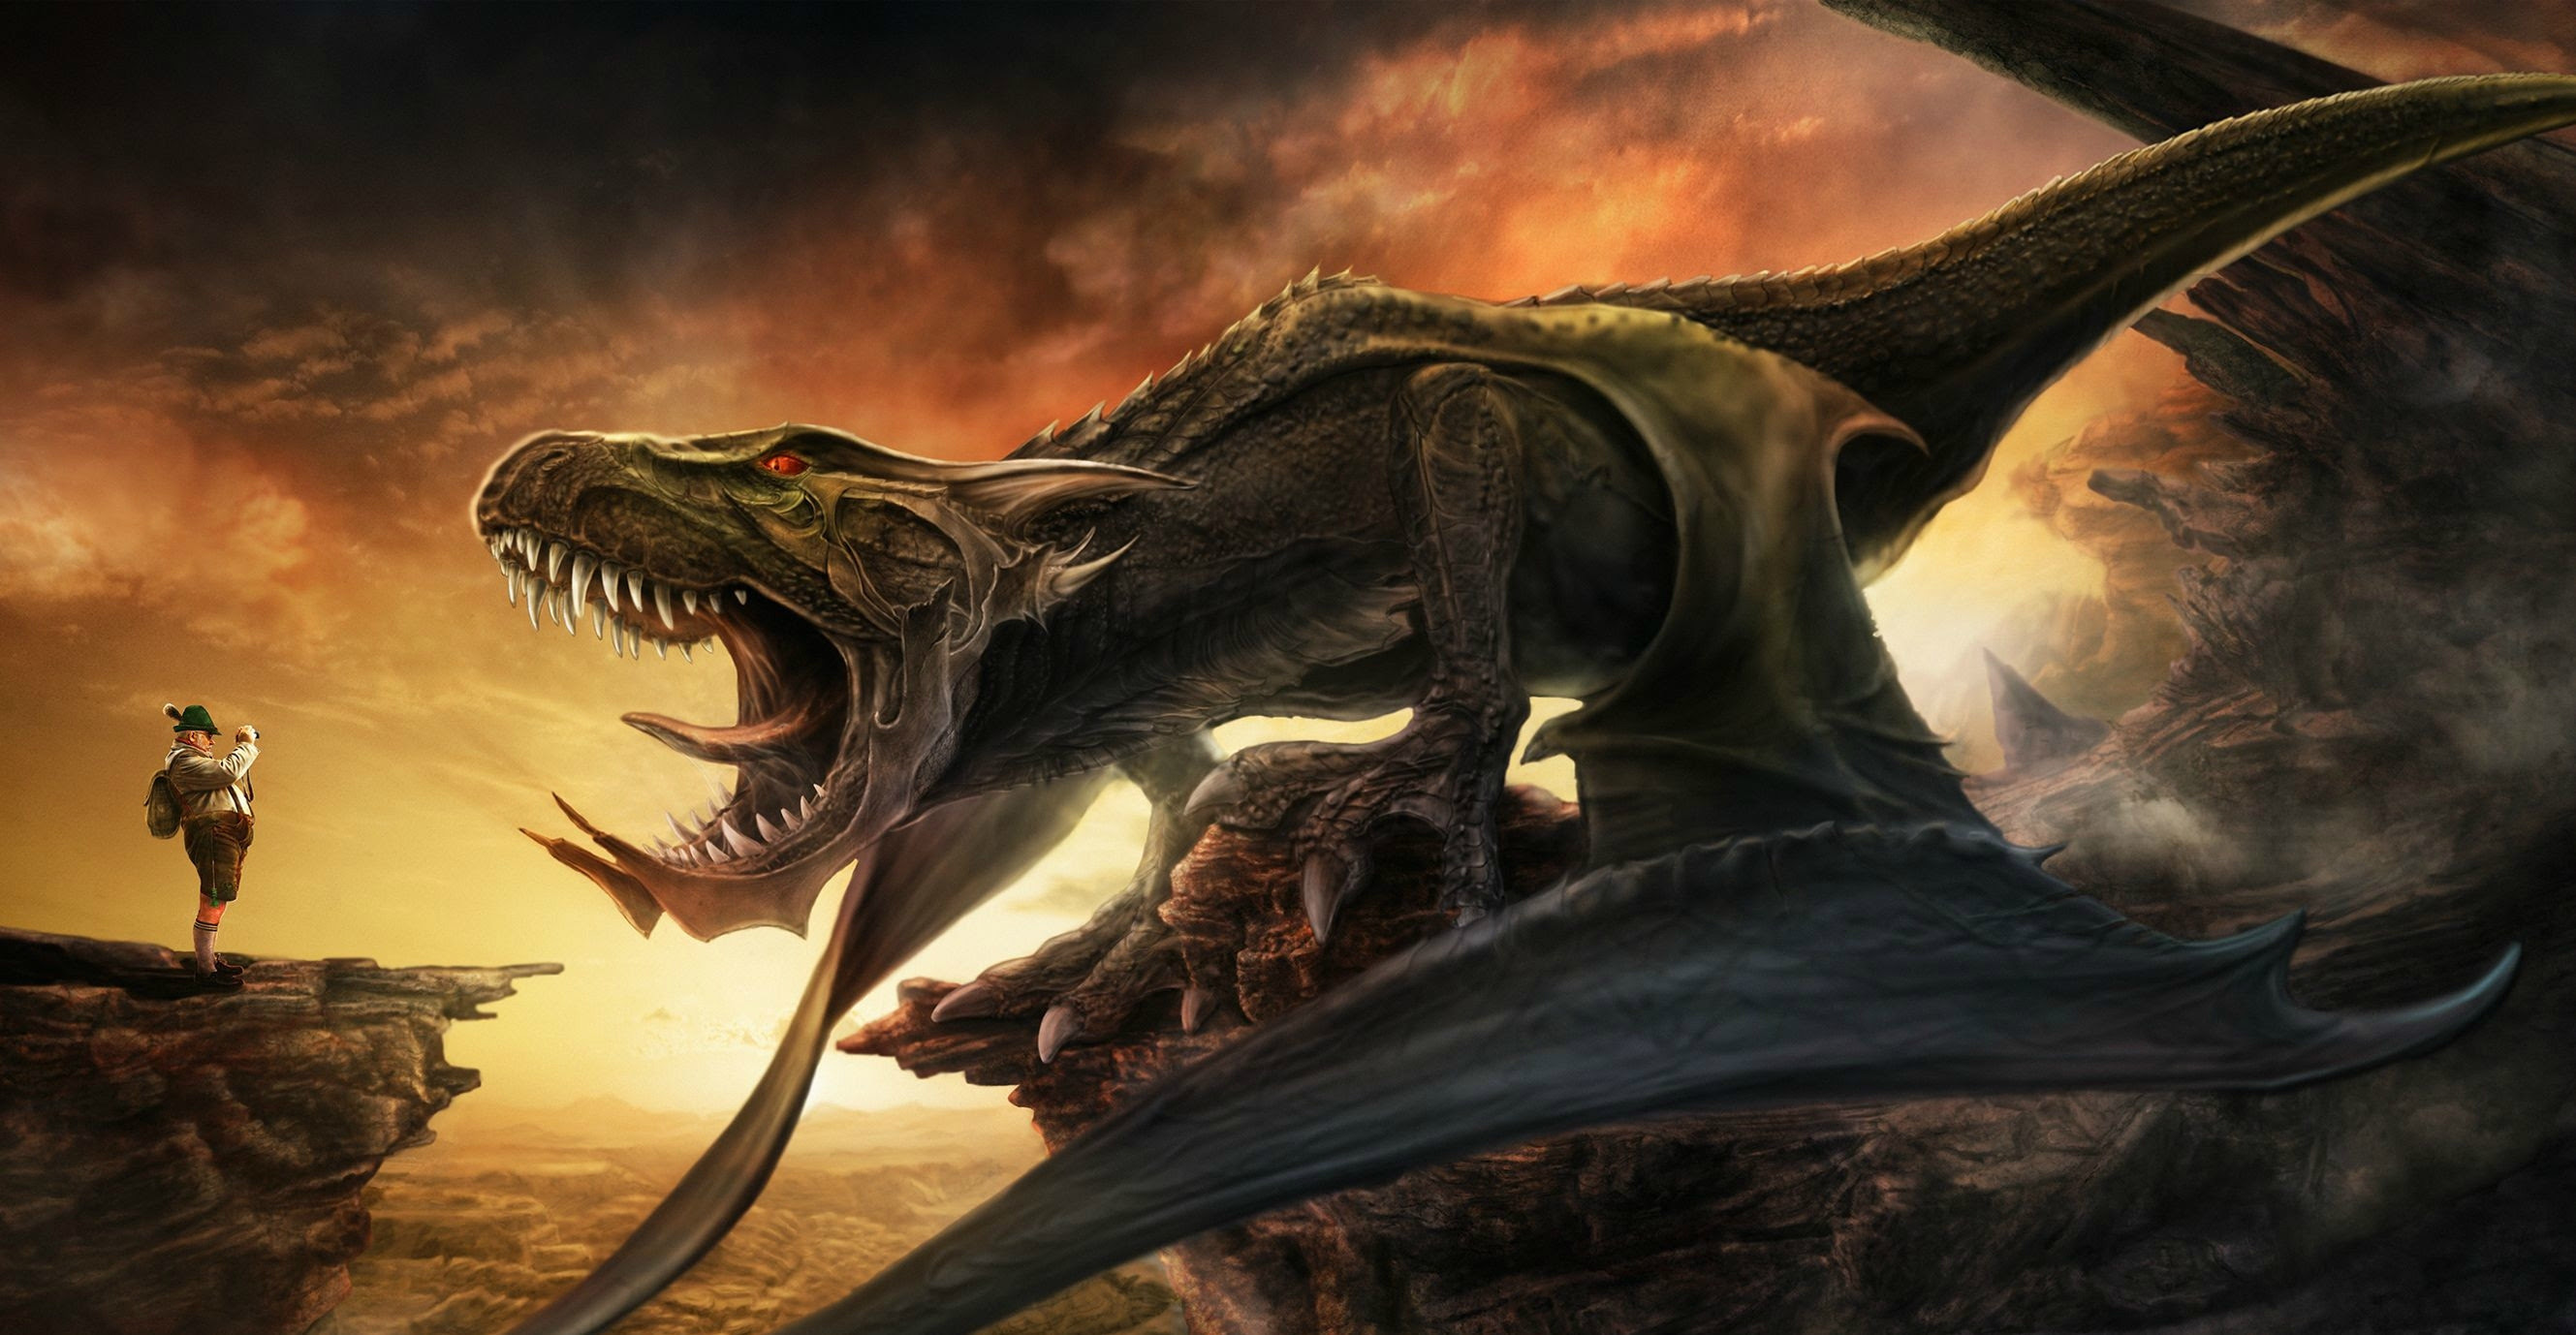 Cool Dinosaur Wallpaper (54+ images)